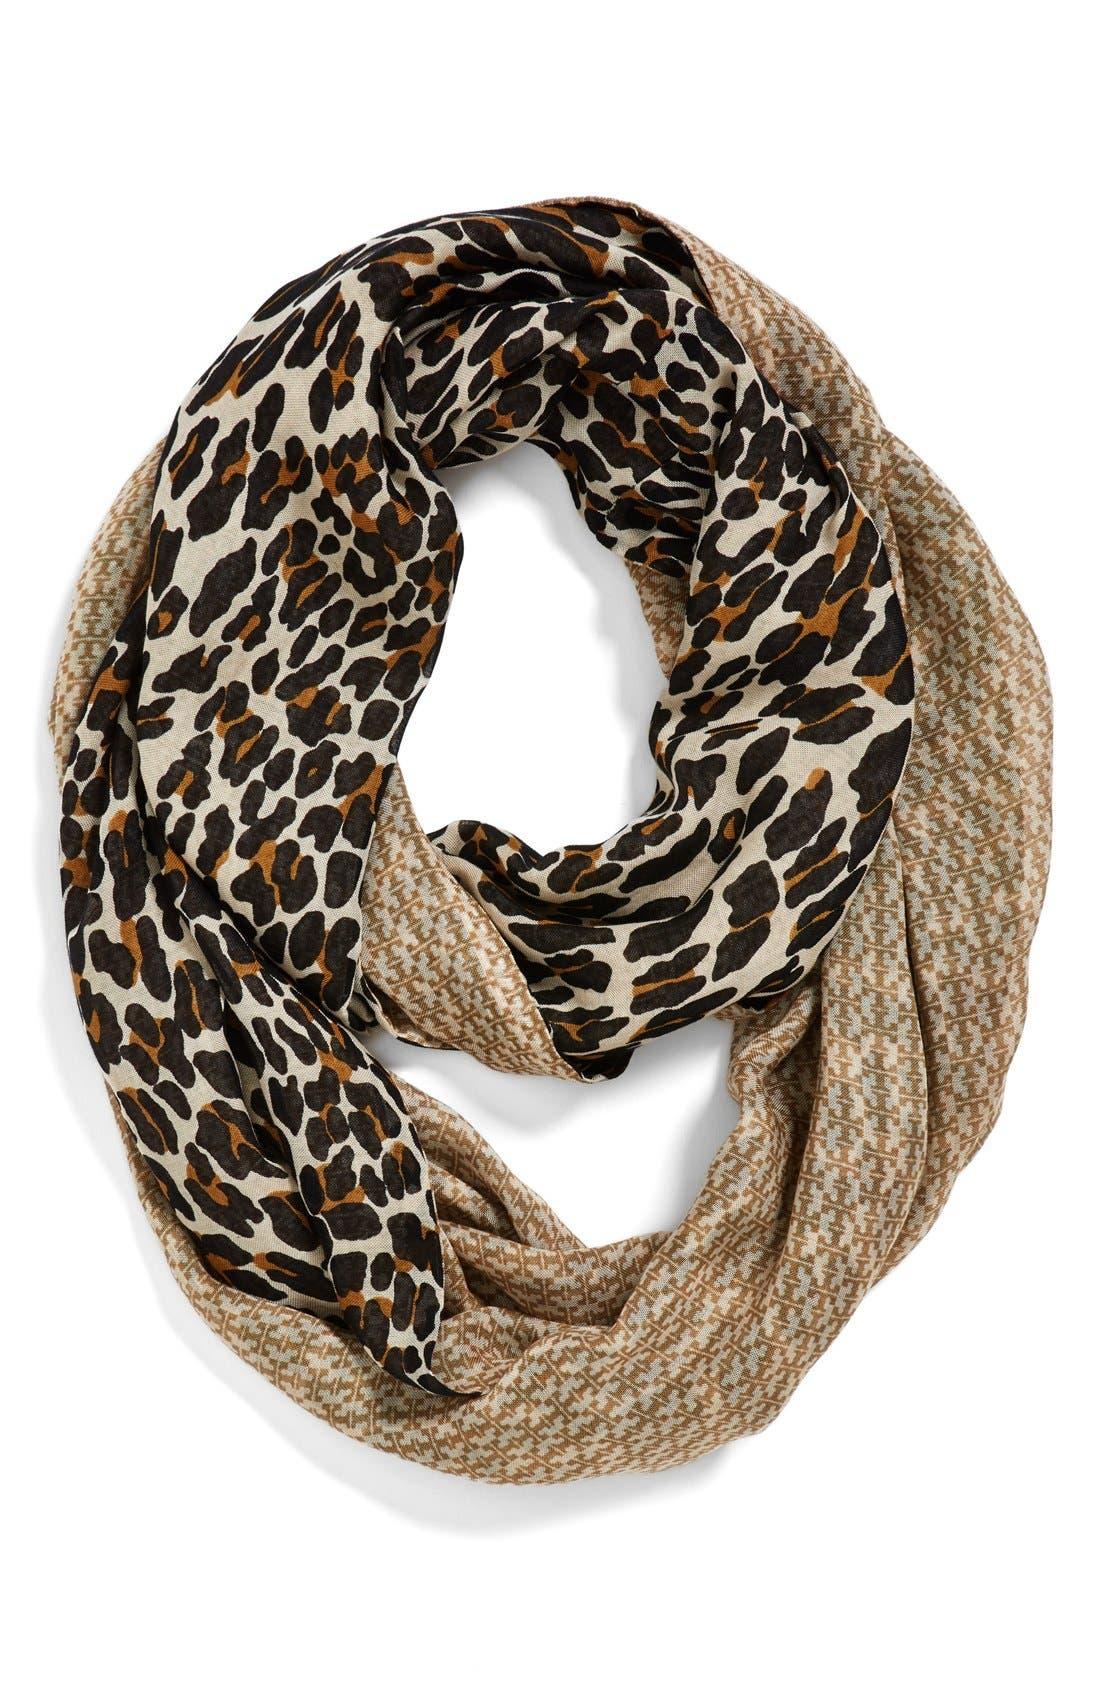 Alternate Image 1 Selected - Tory Burch 'Reva Leopard' Infinity Scarf